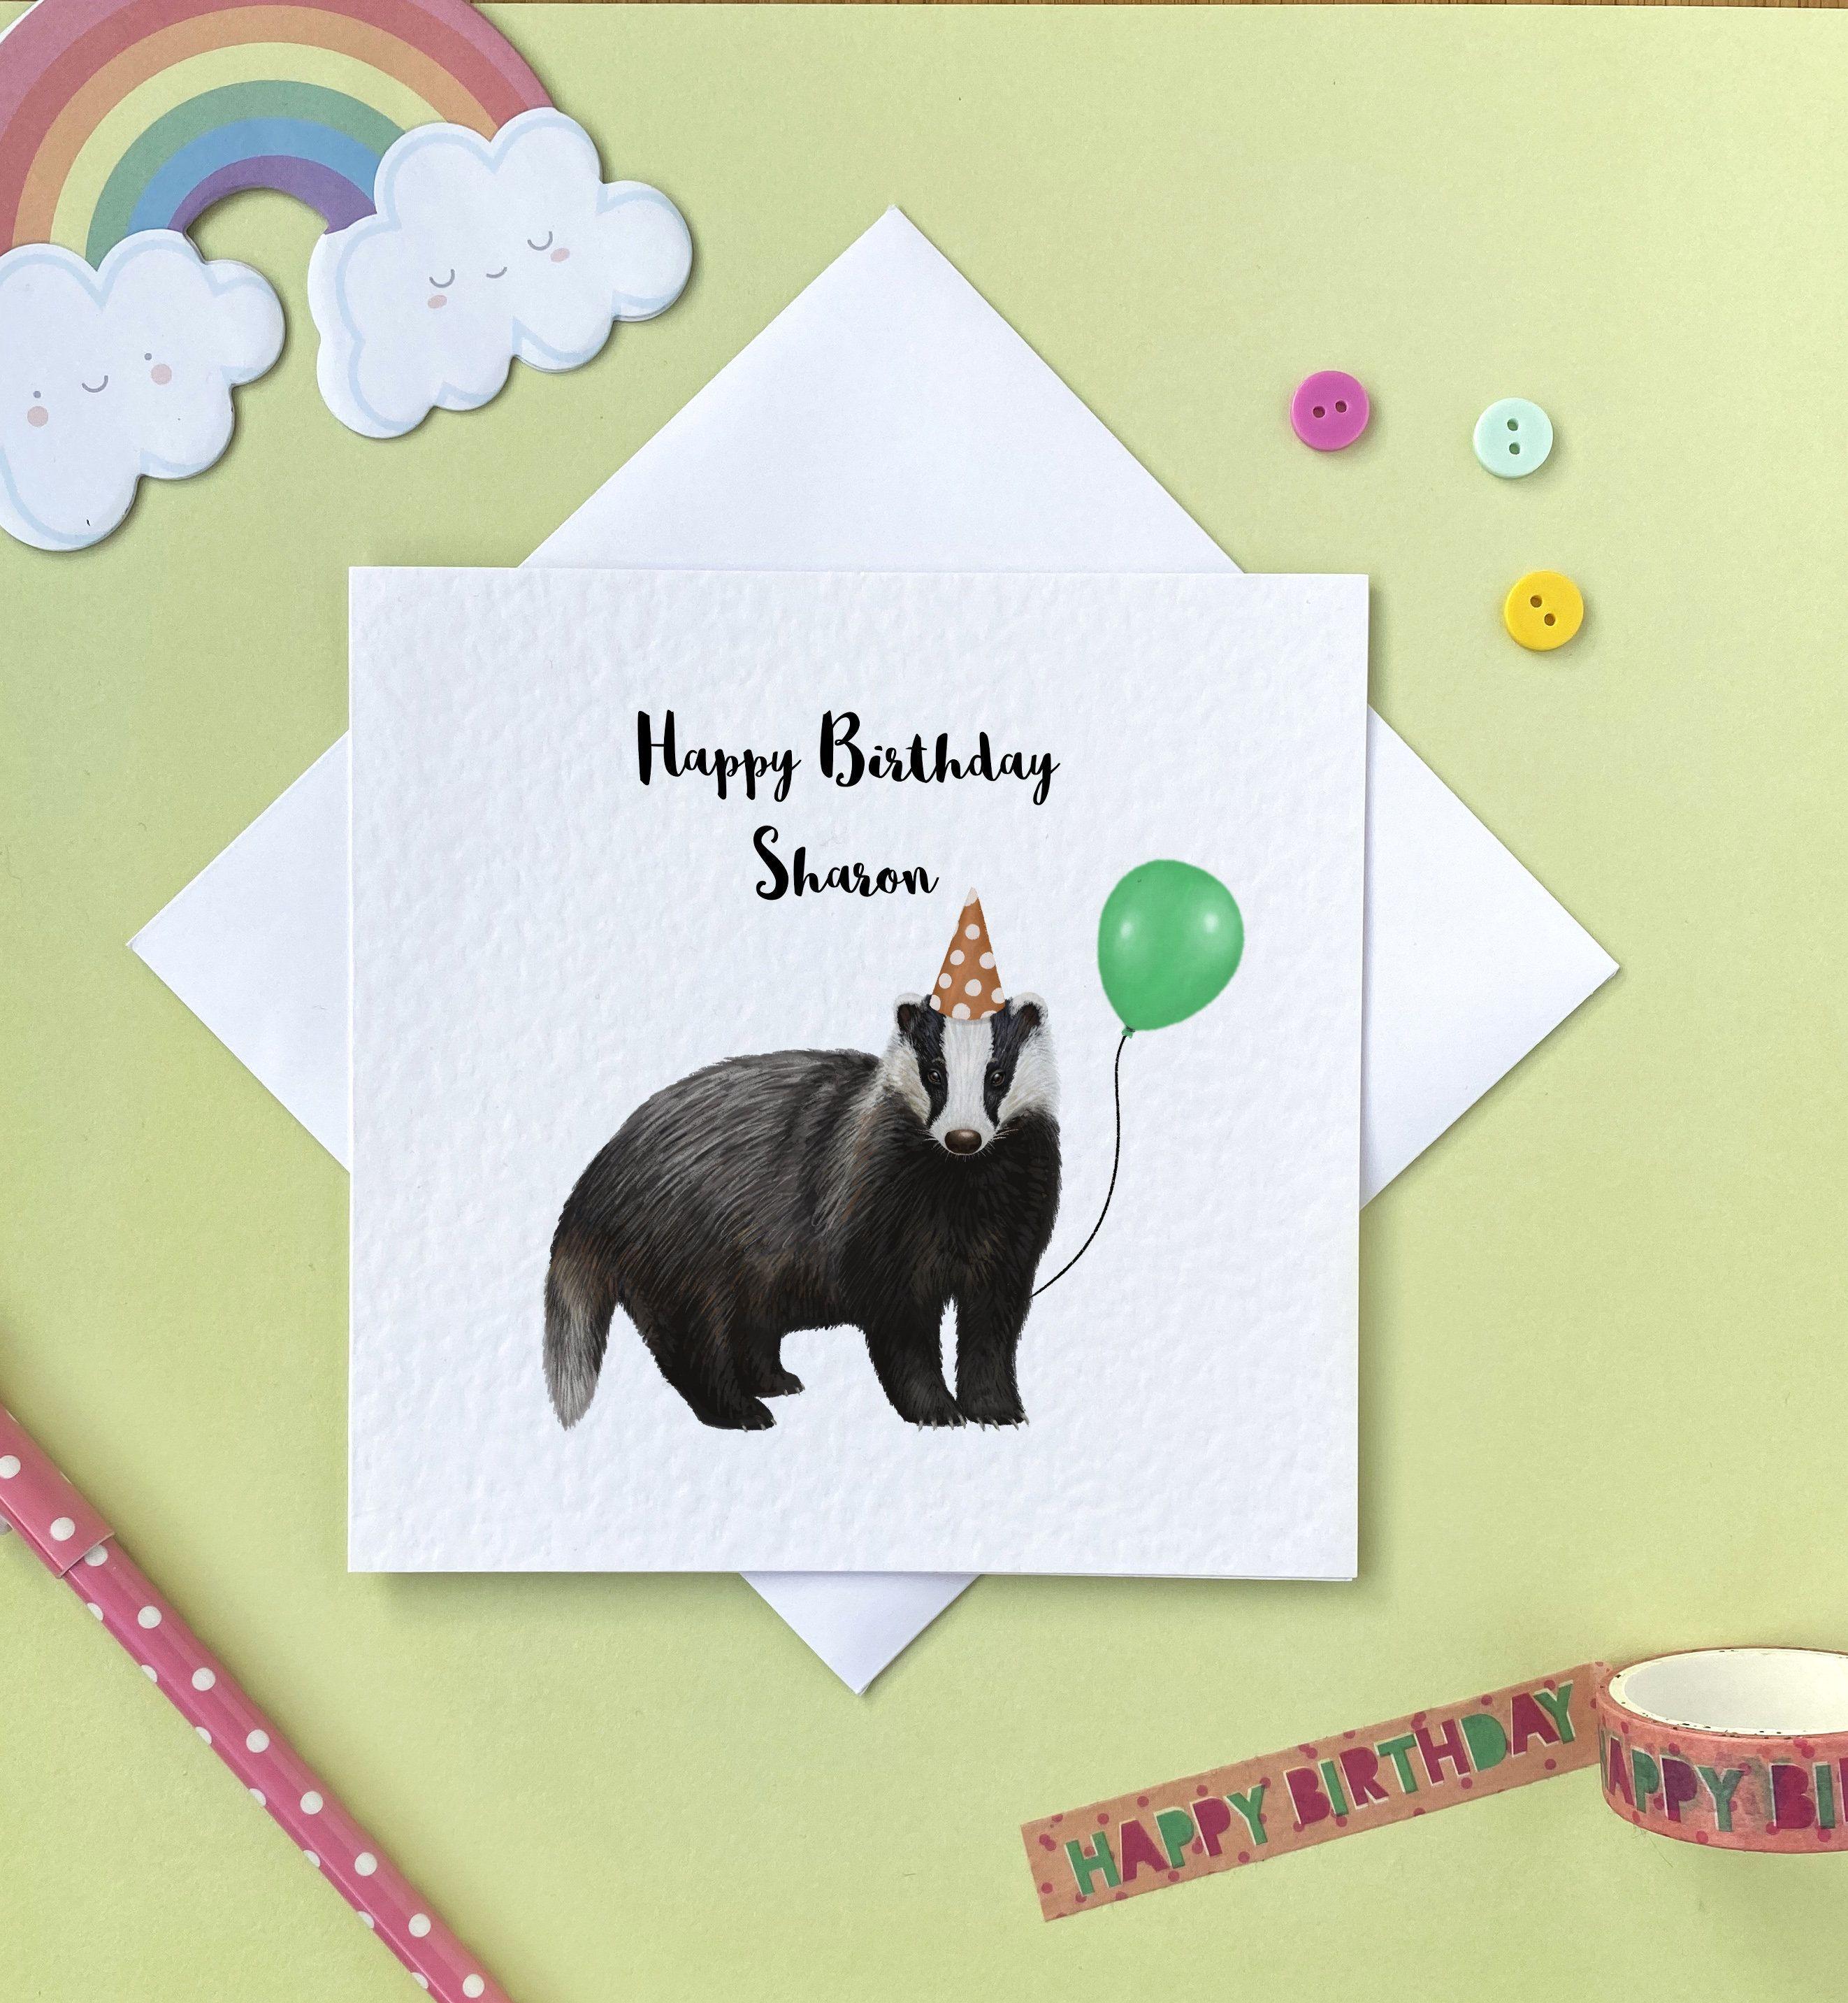 Badger Birthday Card Cute Birthday Card Badger Card Personalised Card Cute Badger Card Card For Cute Birthday Cards Birthday Cards Birthday Cards For Him